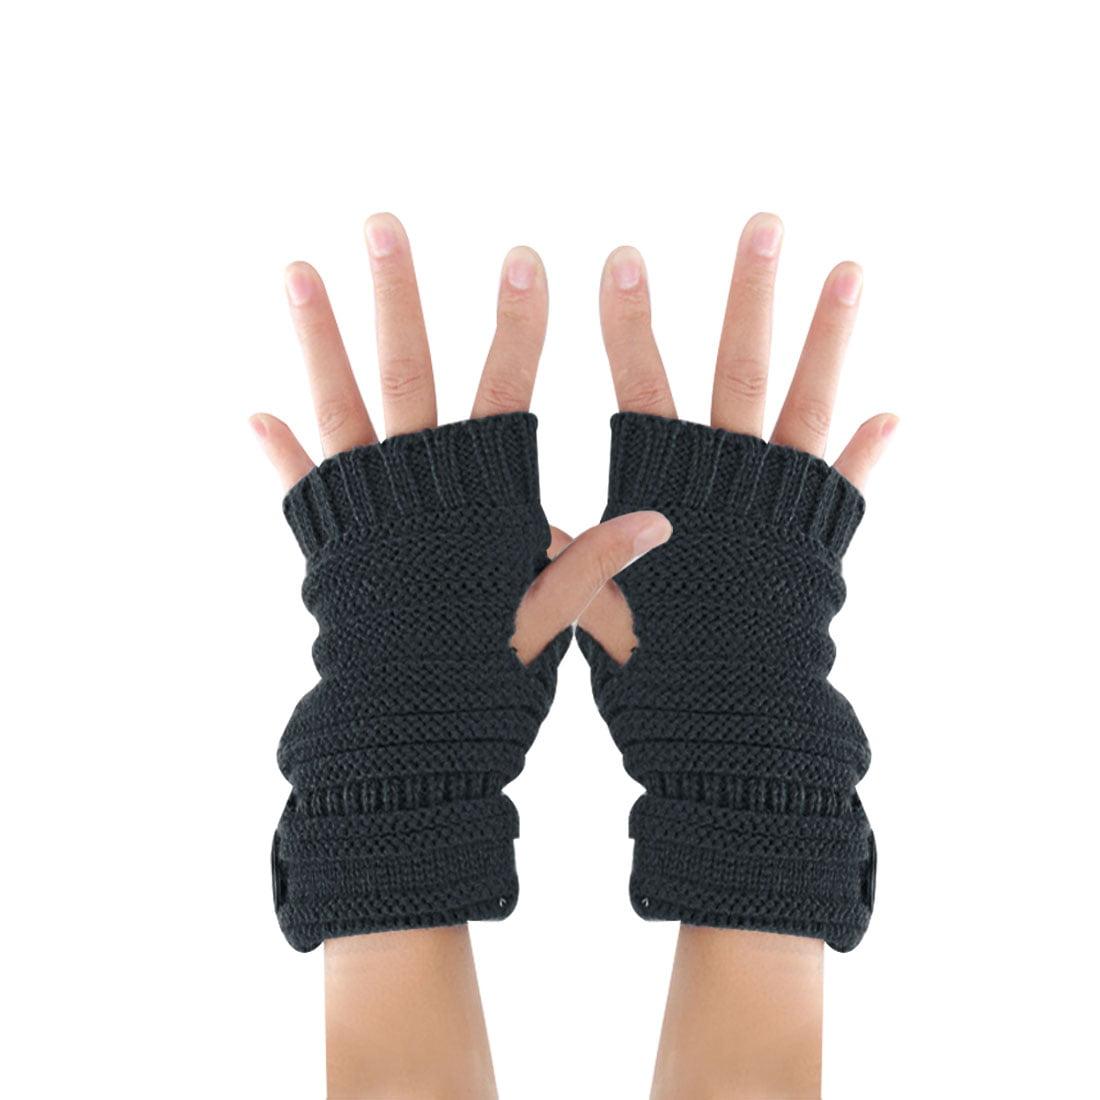 Tasharina Unisex Textured Single Button Decor Acrylic Winter Cozy Gloves Gray